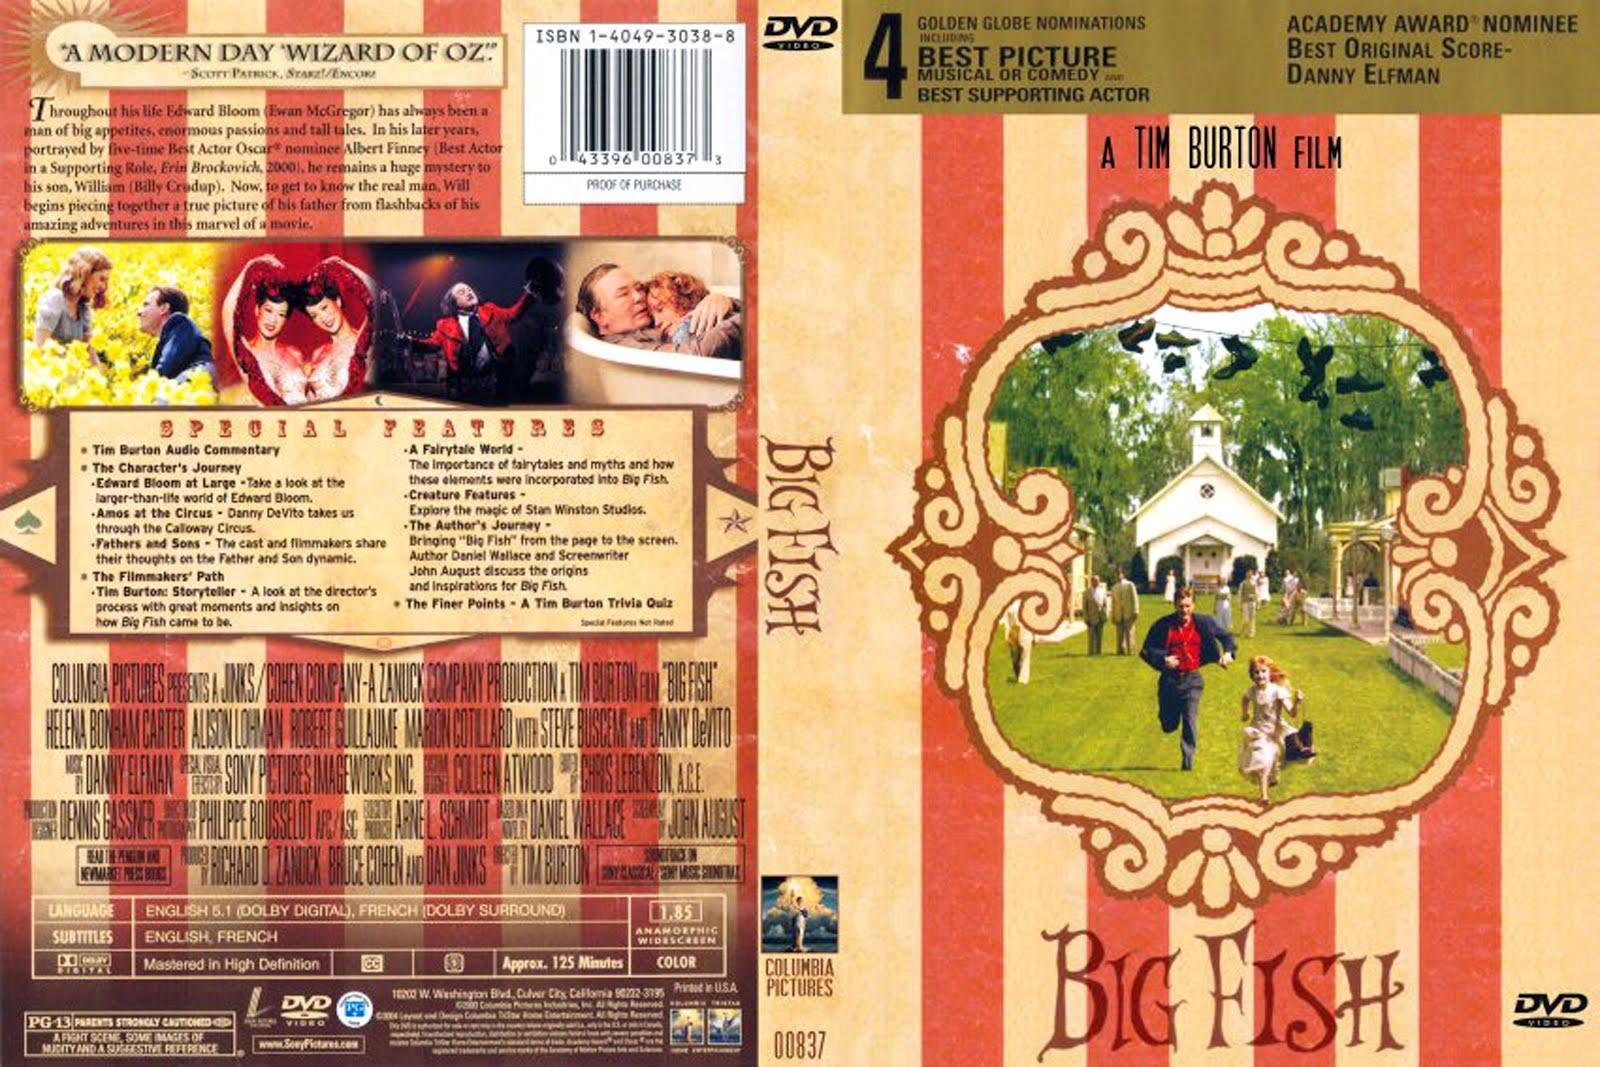 Big Fish Dvd Cover